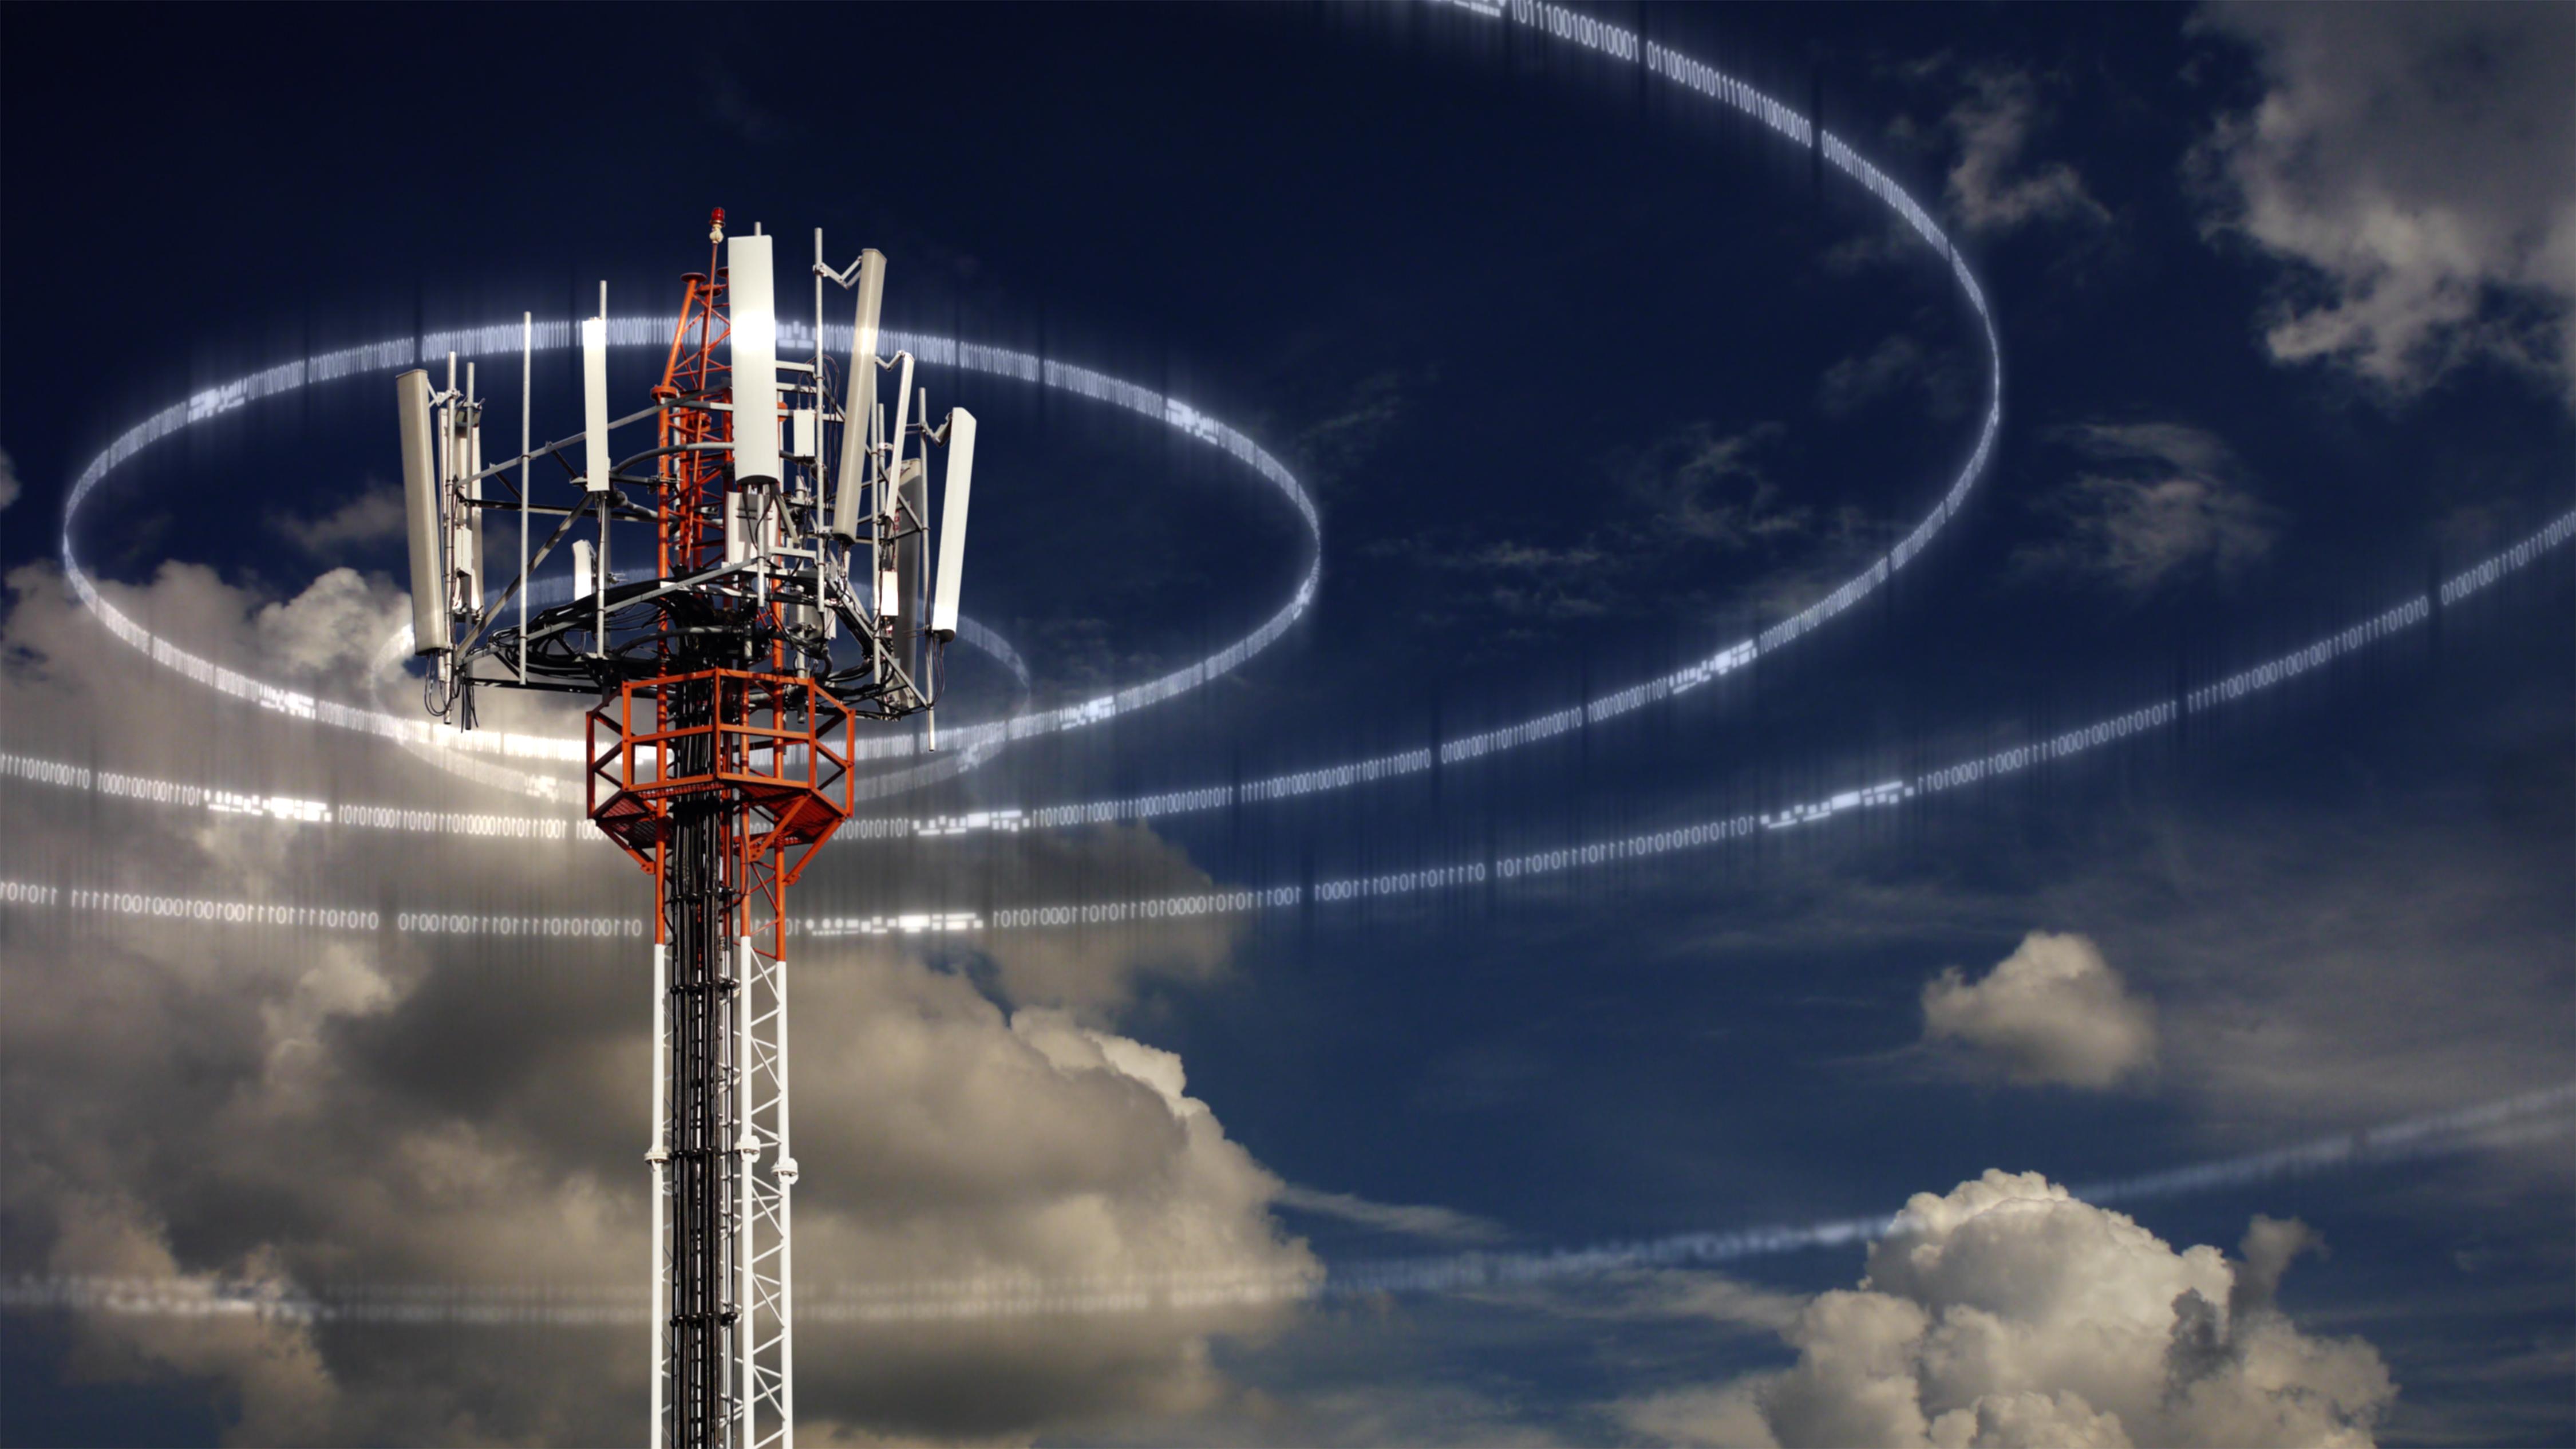 Pylon plus cell tower